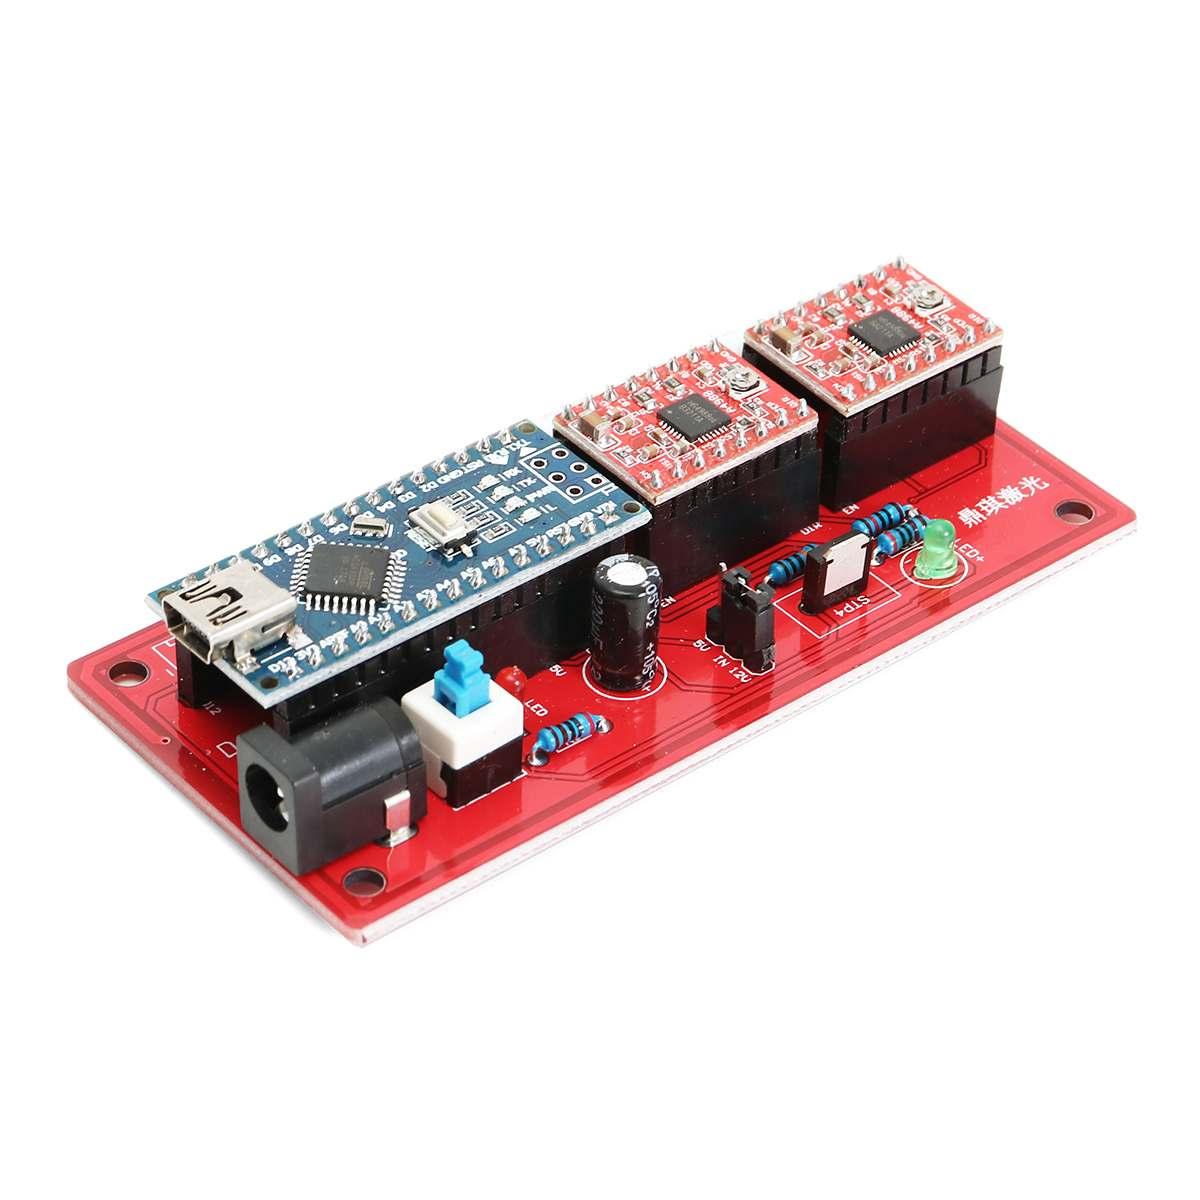 2 achse USB Control Board DIY CNC Laser Gravur Maschine Controller Panel Unterstützung Laser Modul Ausgang Anzeige